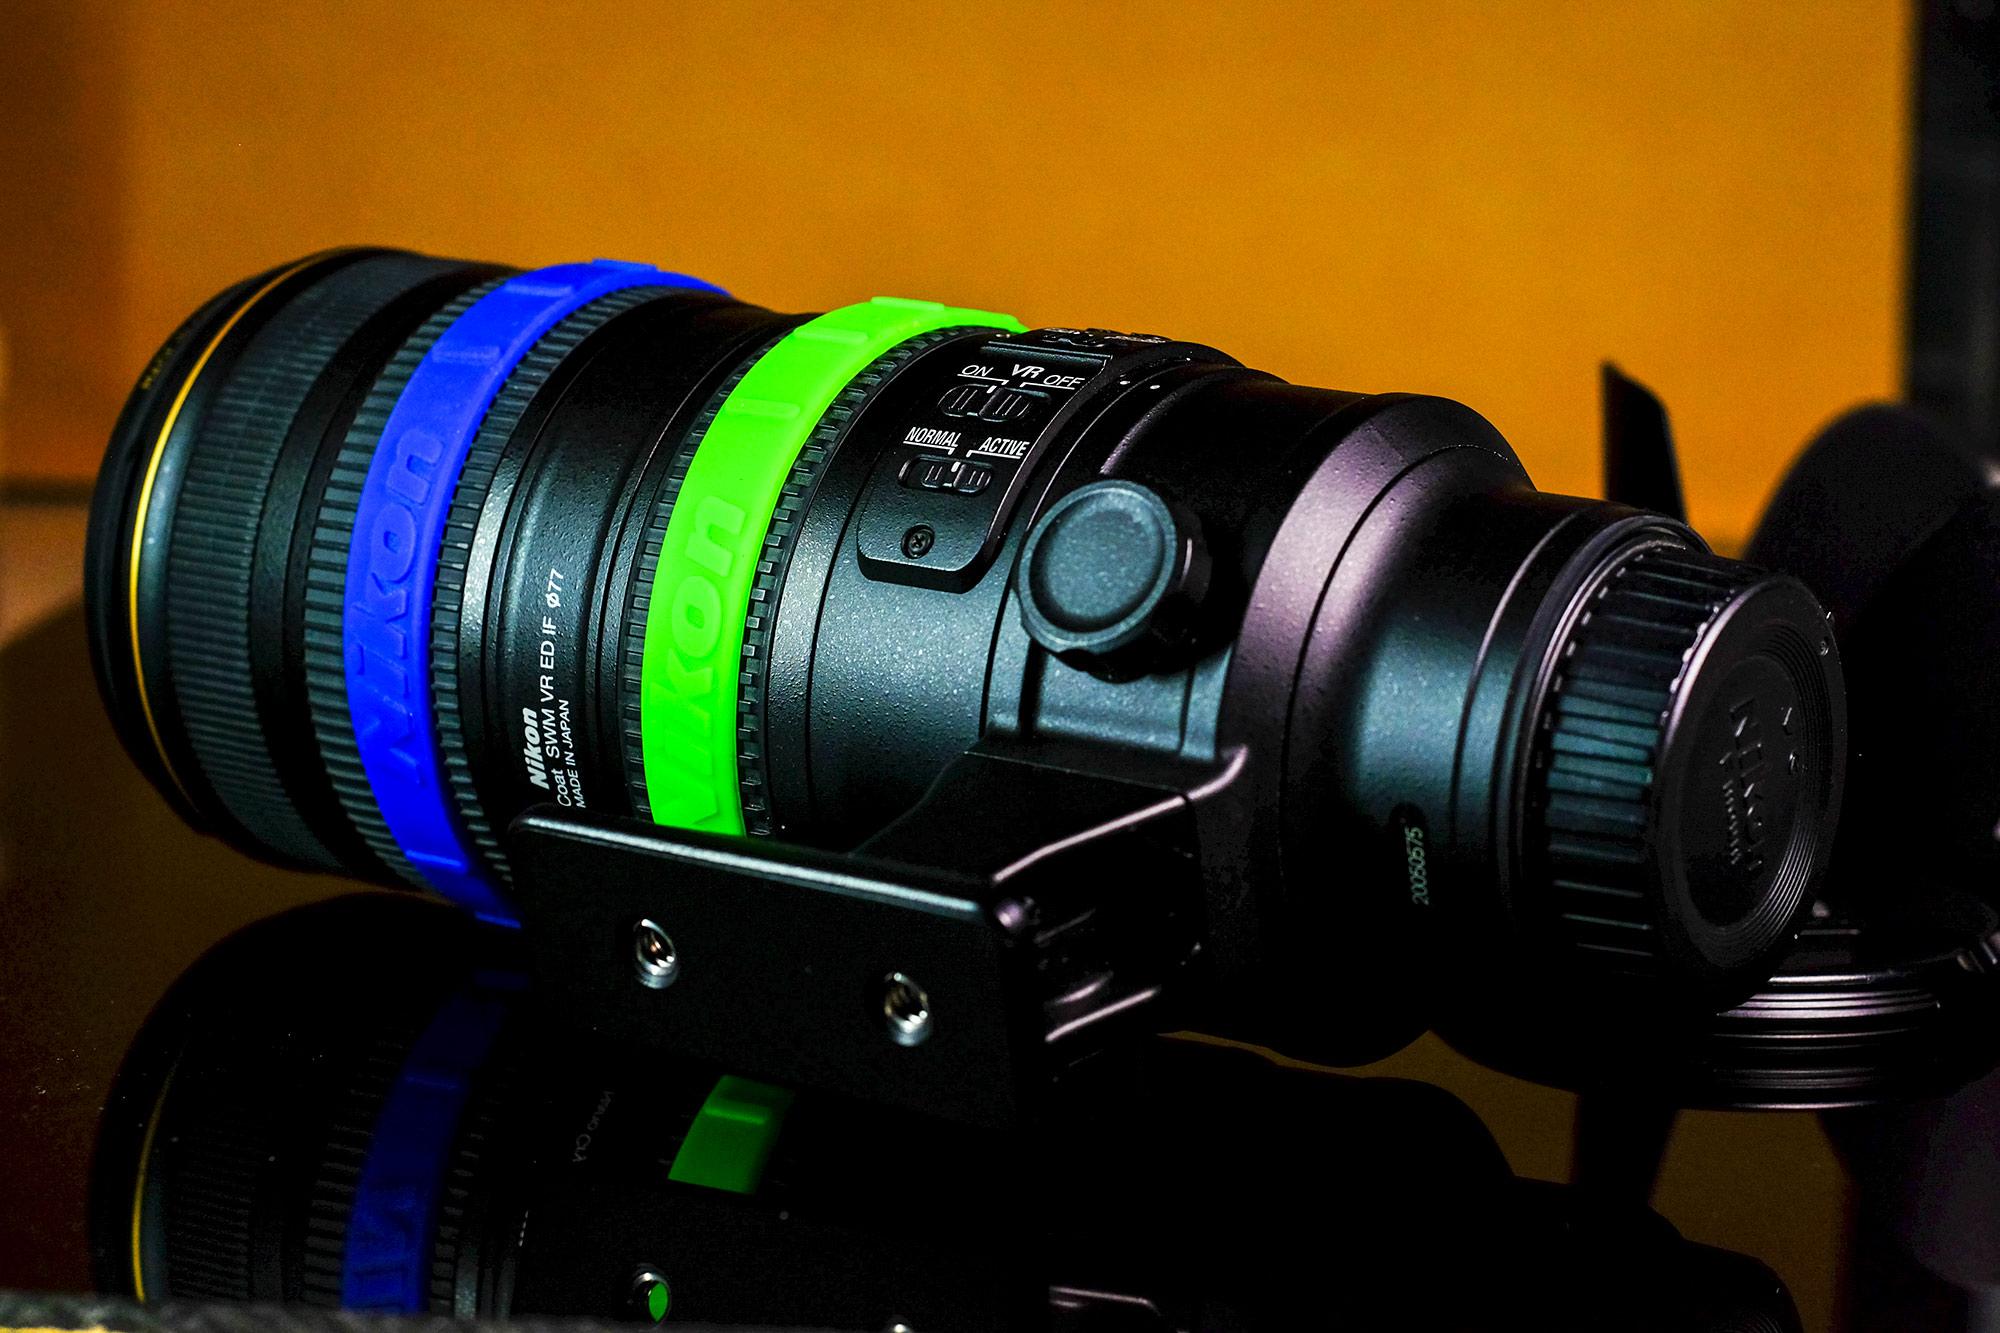 nikon70-200 f2.8(大竹炮)成色极新箱说全9600.送b+w uv镜包顺丰